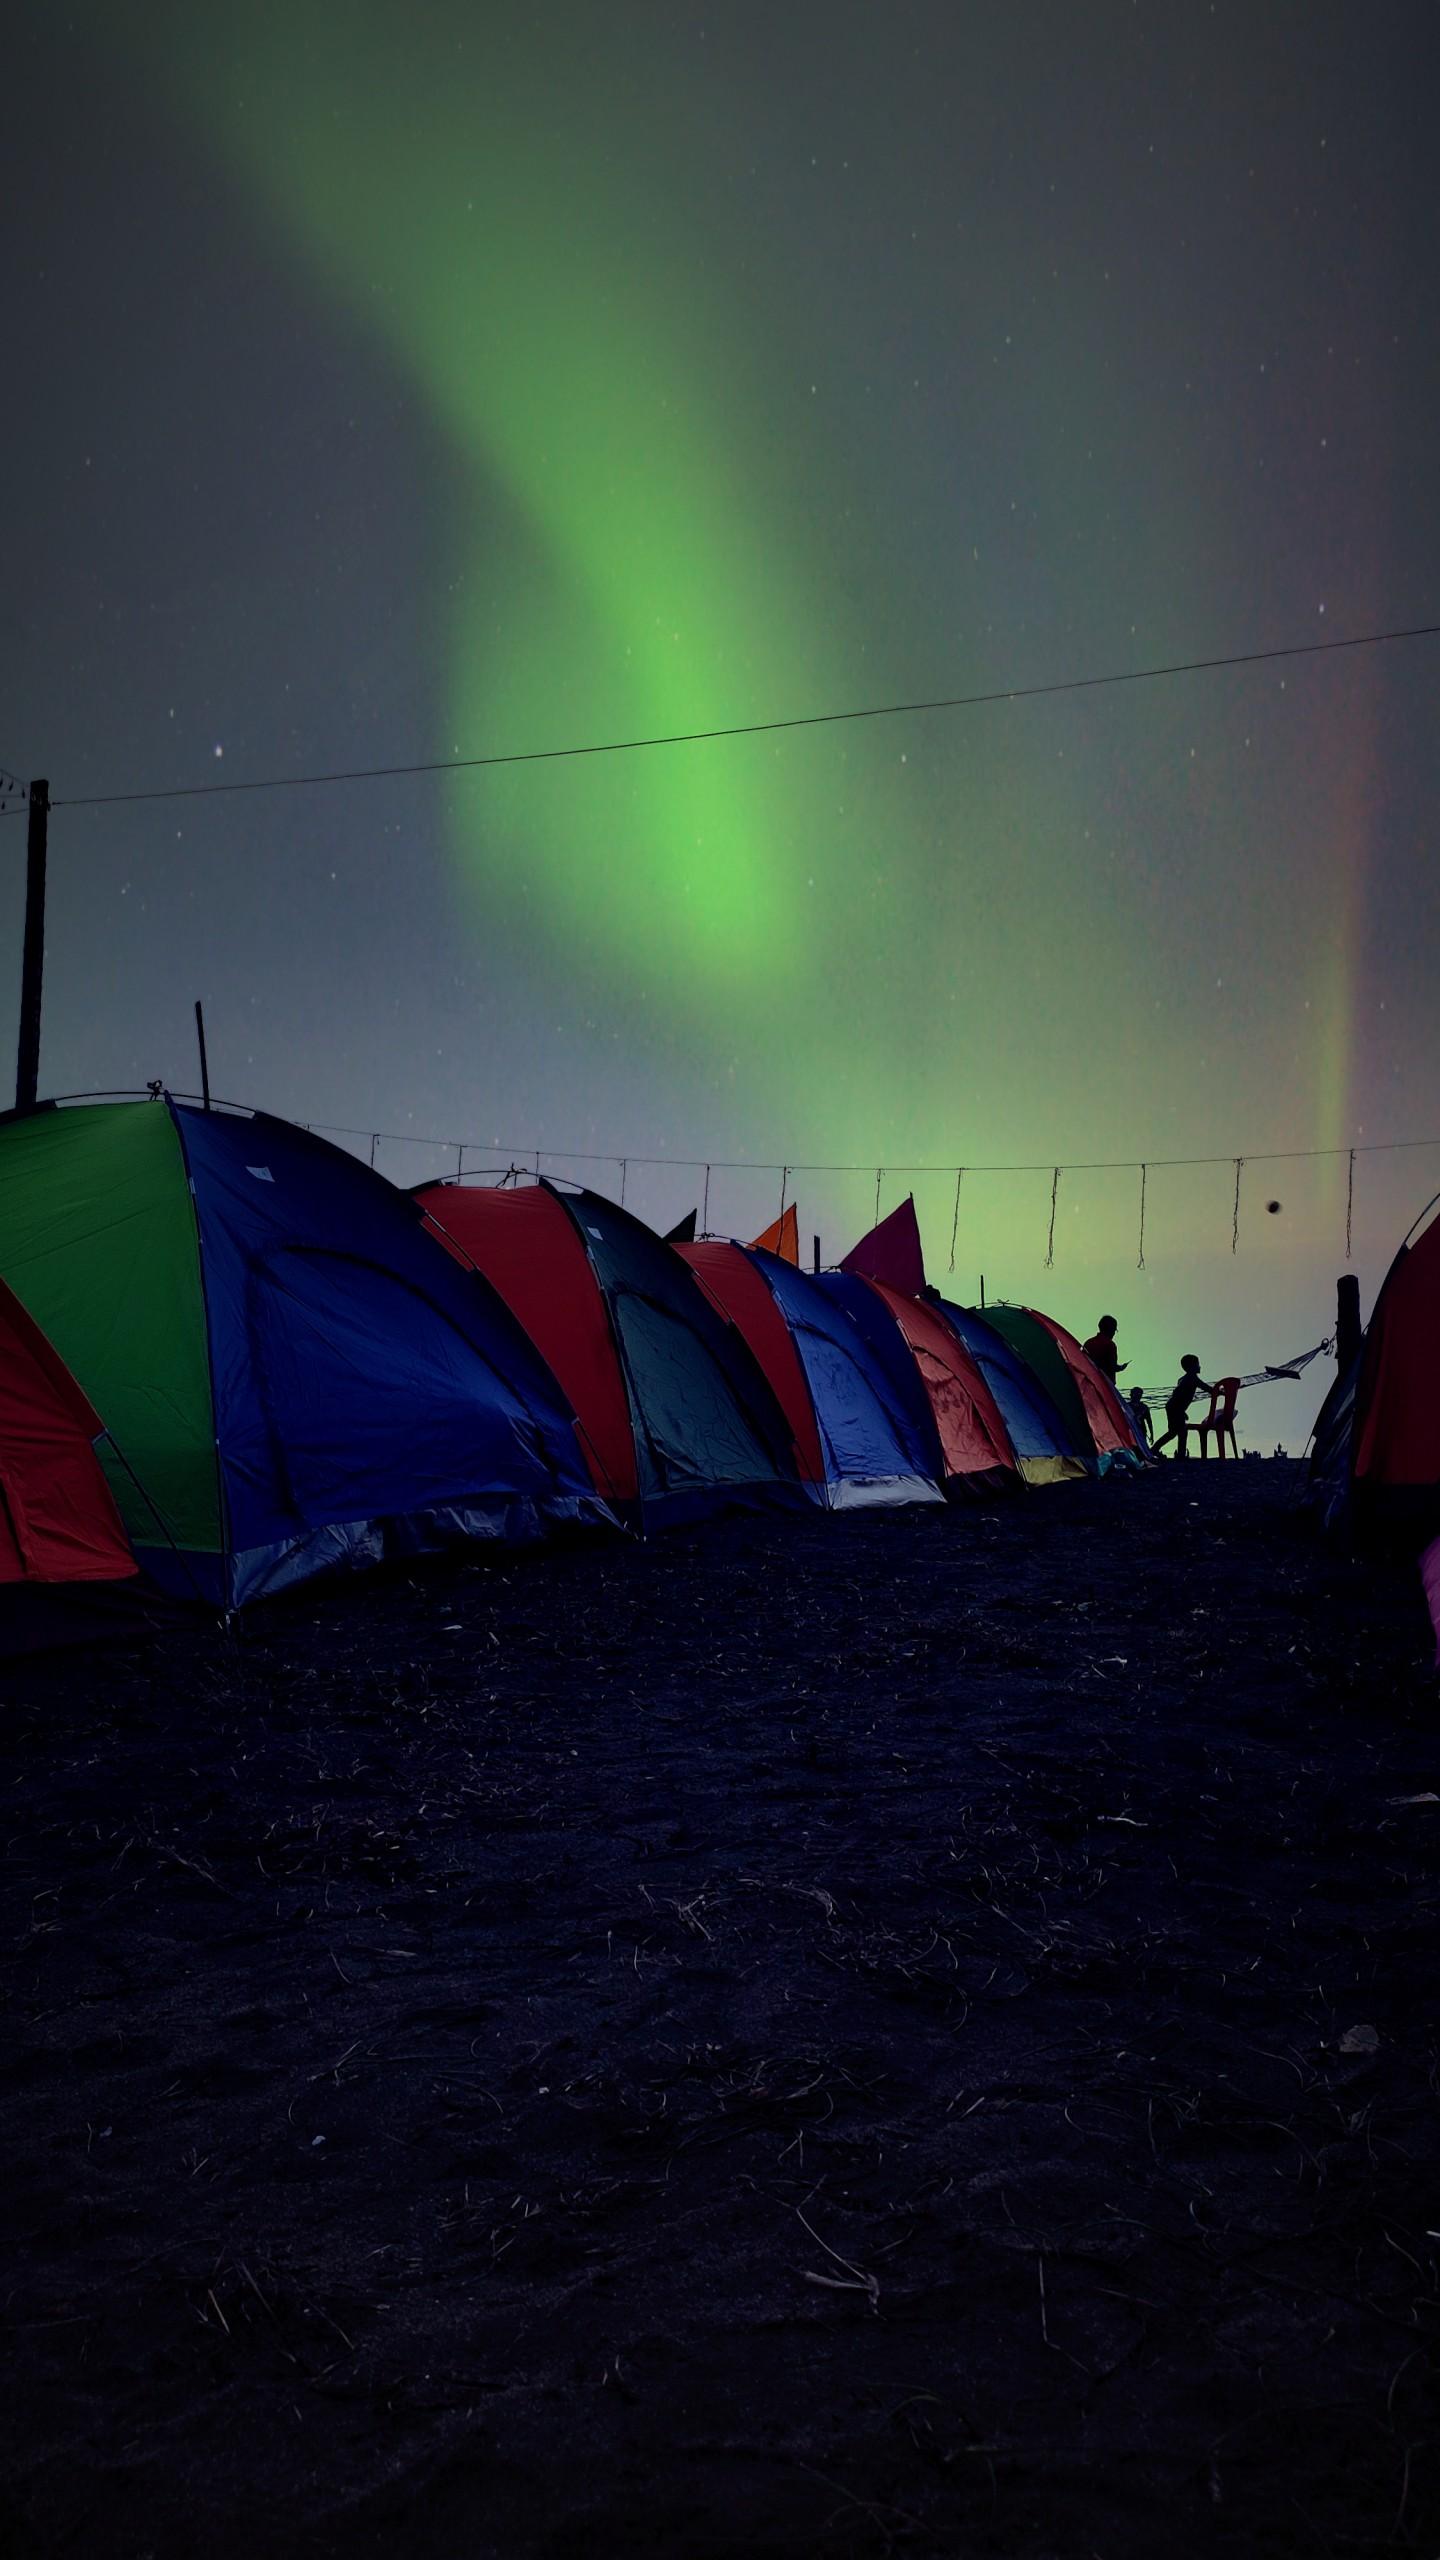 Tents under Aurora Borealis